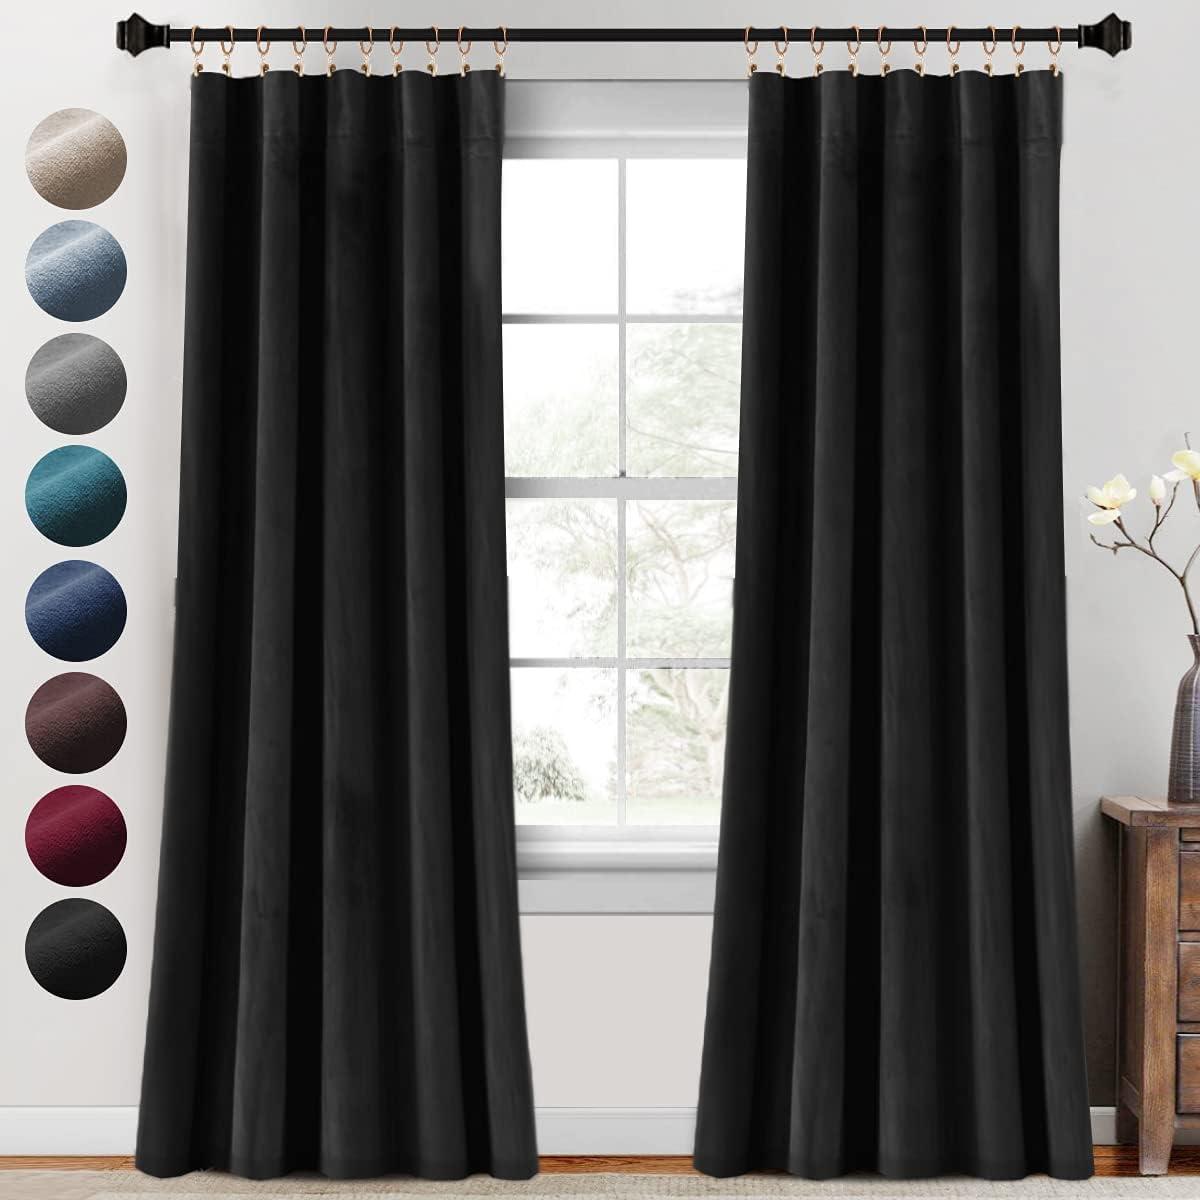 Brand Cheap Sale Venue Luxury Japan Maker New Velvet Curtains Blackout for Living 2 Panels Inch 95 Room